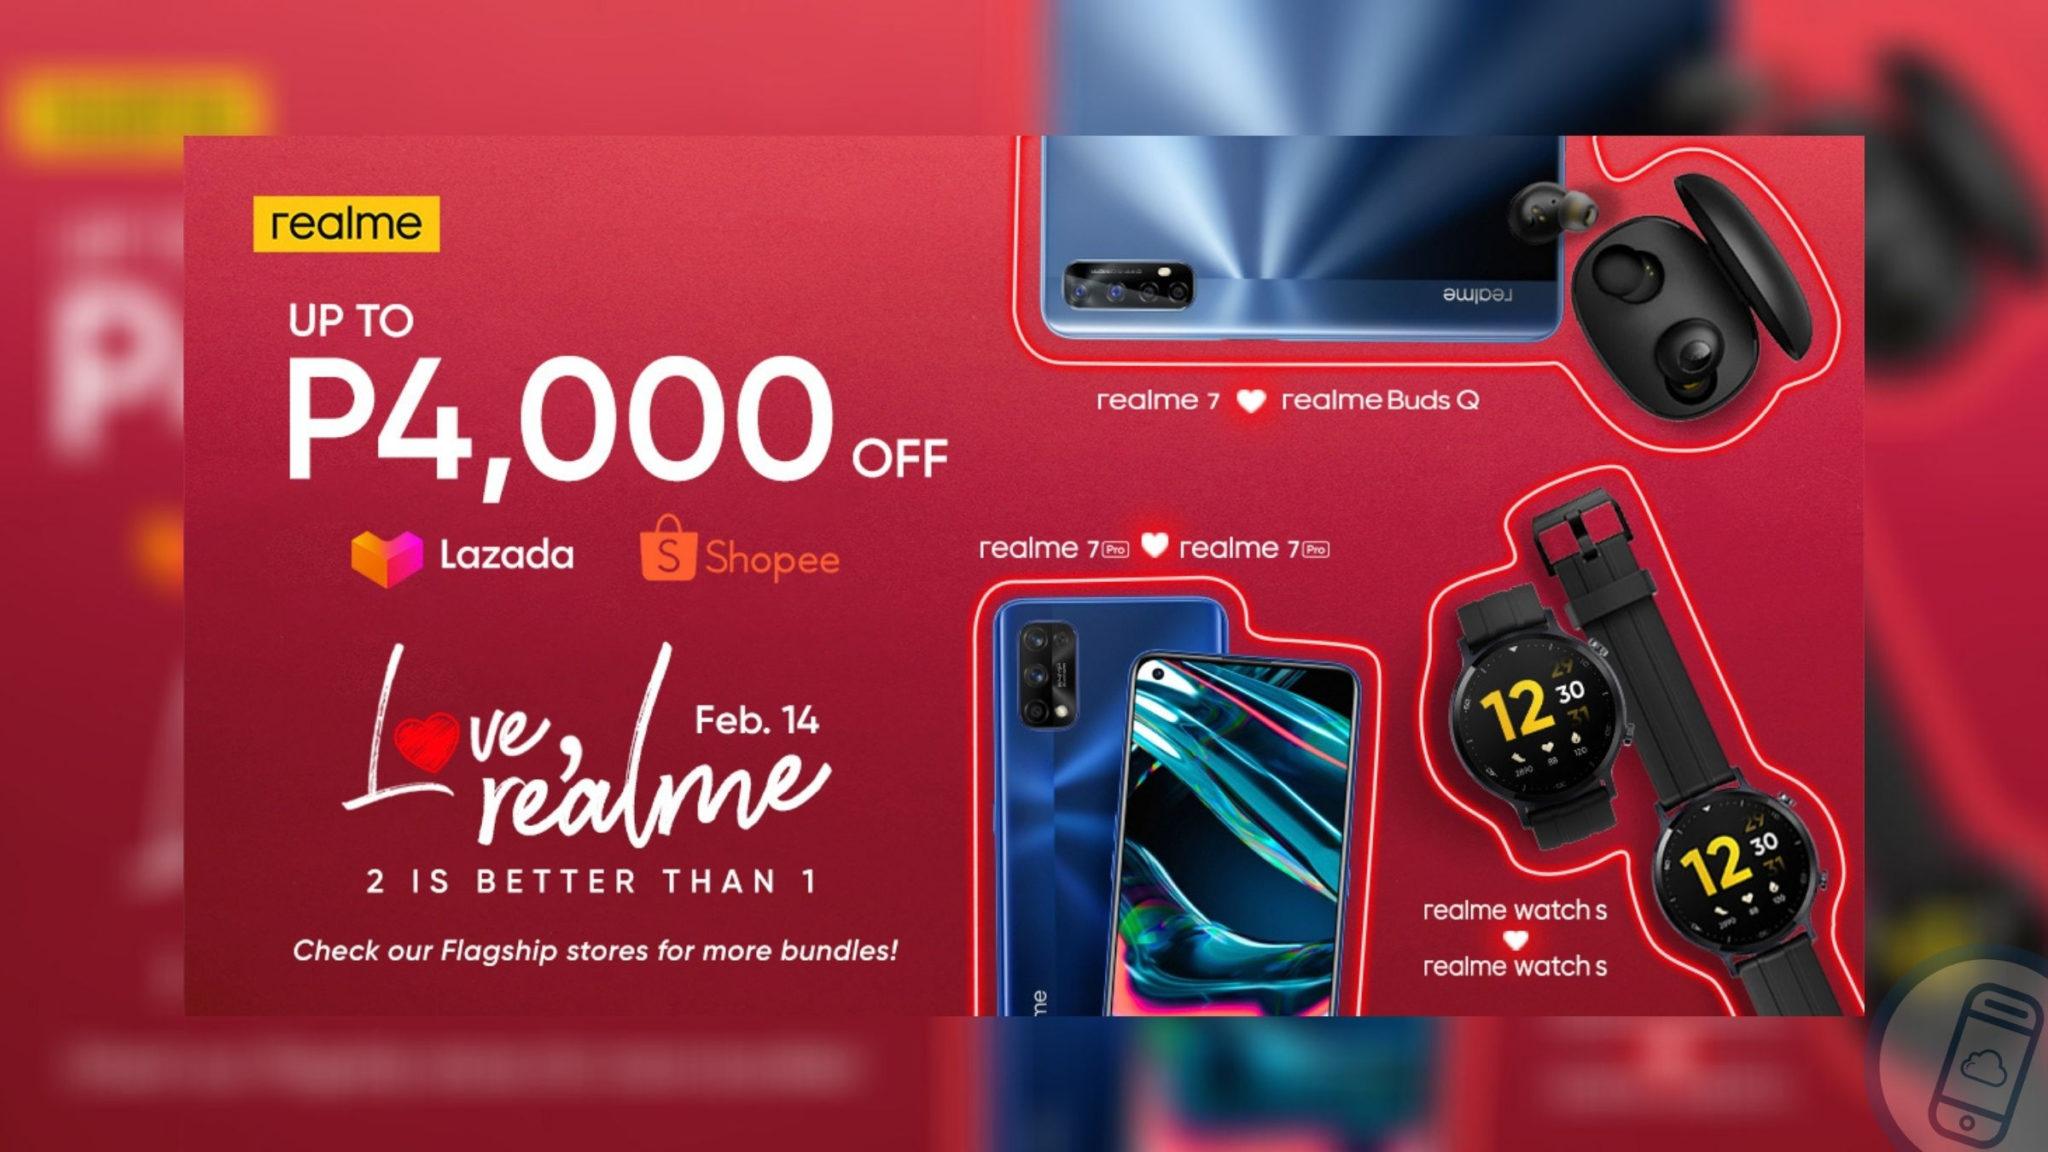 realme PH Launches Valentine's Day Bundles Header